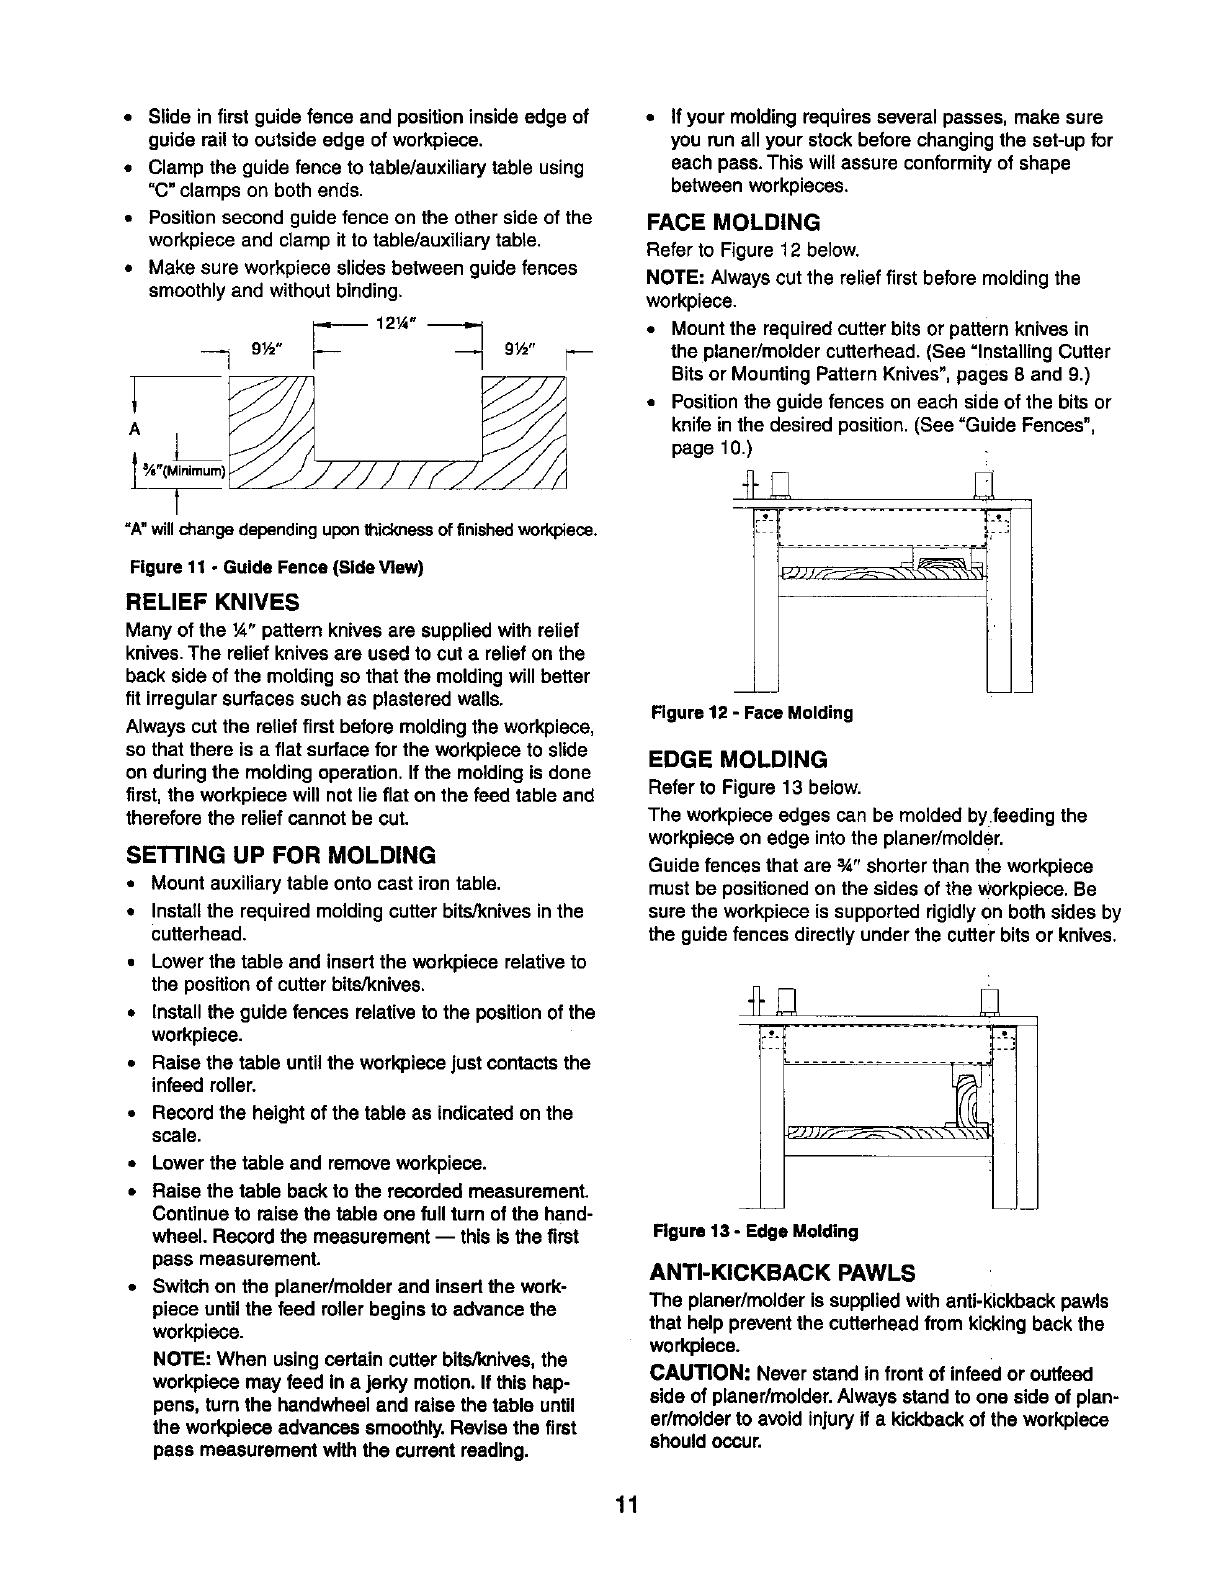 Craftsman 351233831 User Manual 12 1/2 PLANER / MOLDER